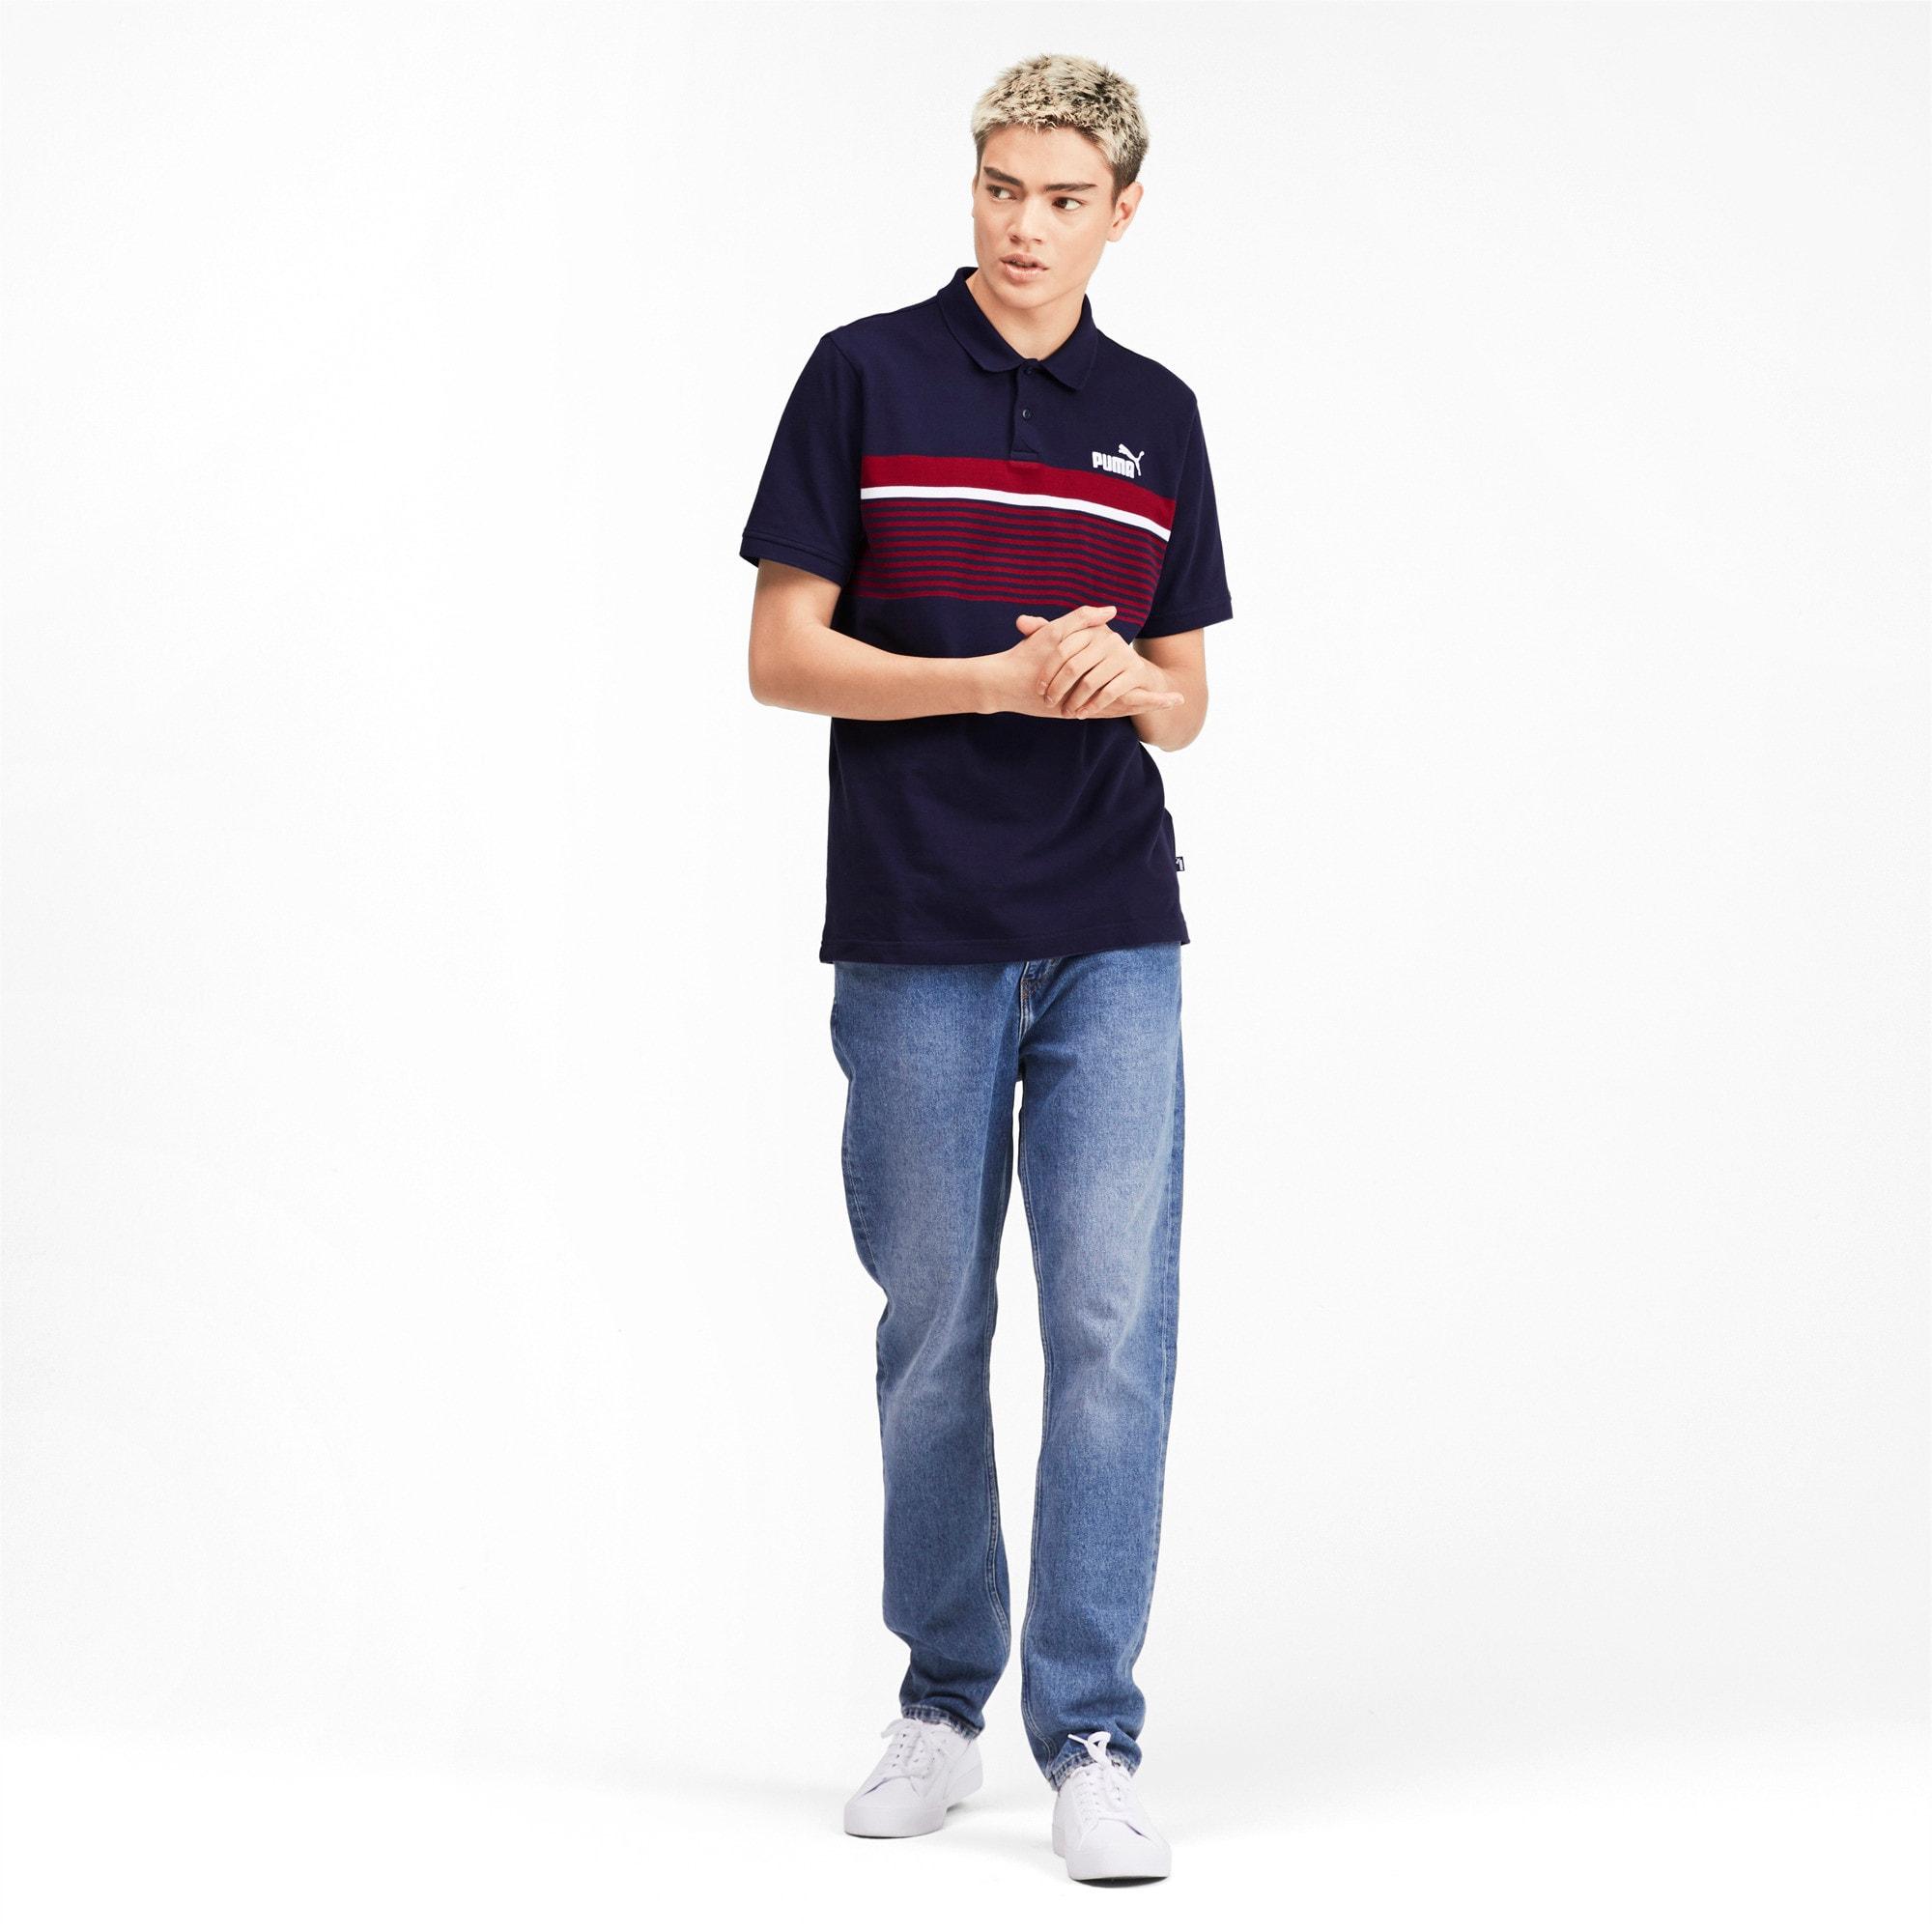 Miniatura 4 de Camiseta tipo polo ESS+ Striped para hombre, Peacoat, mediano